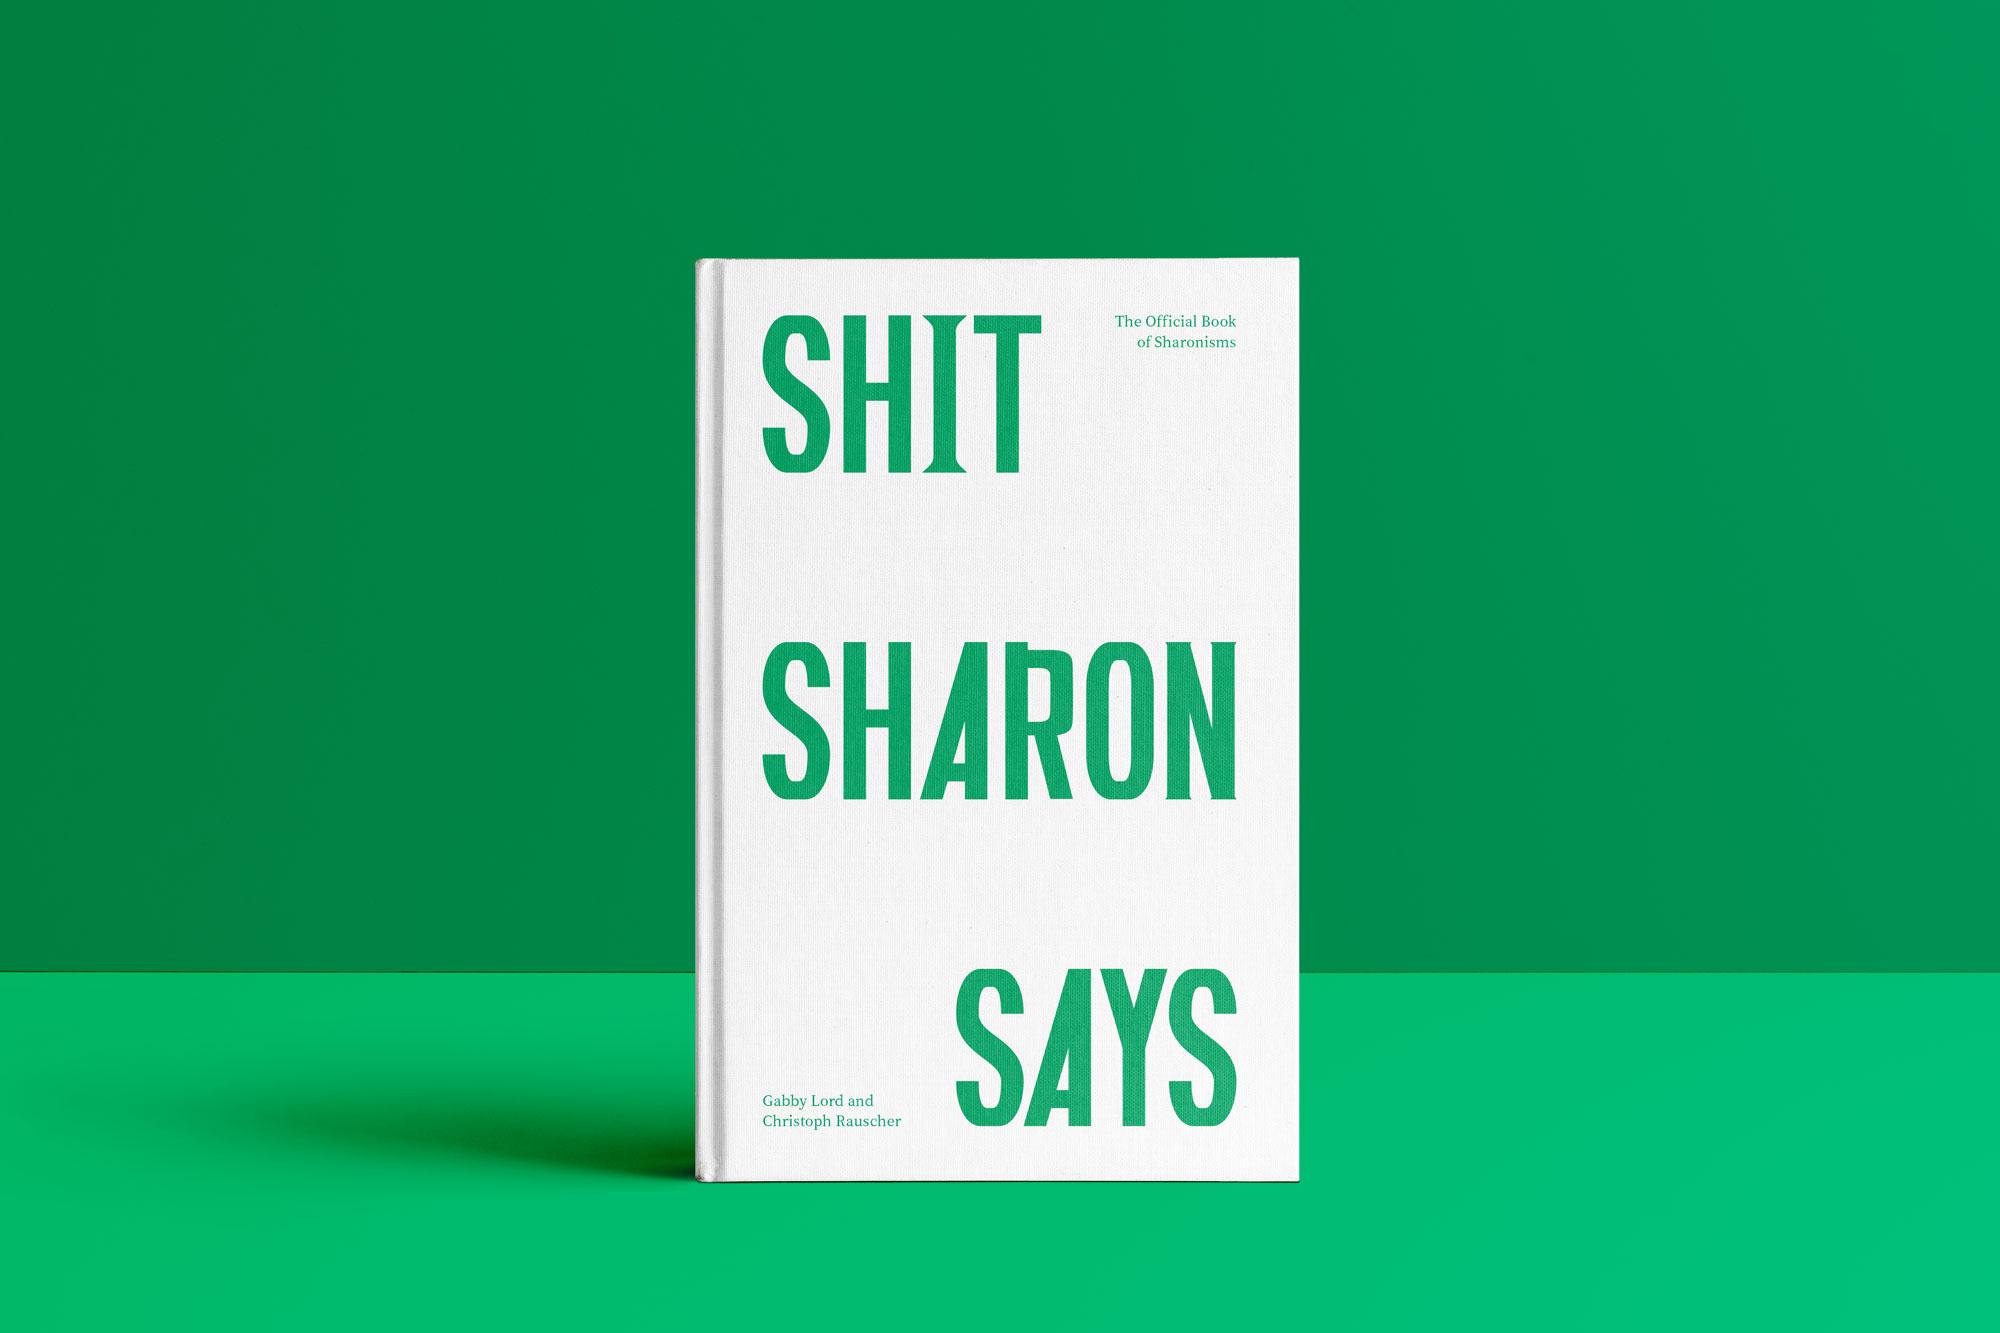 book-of-sharonisms-mockup.jpg